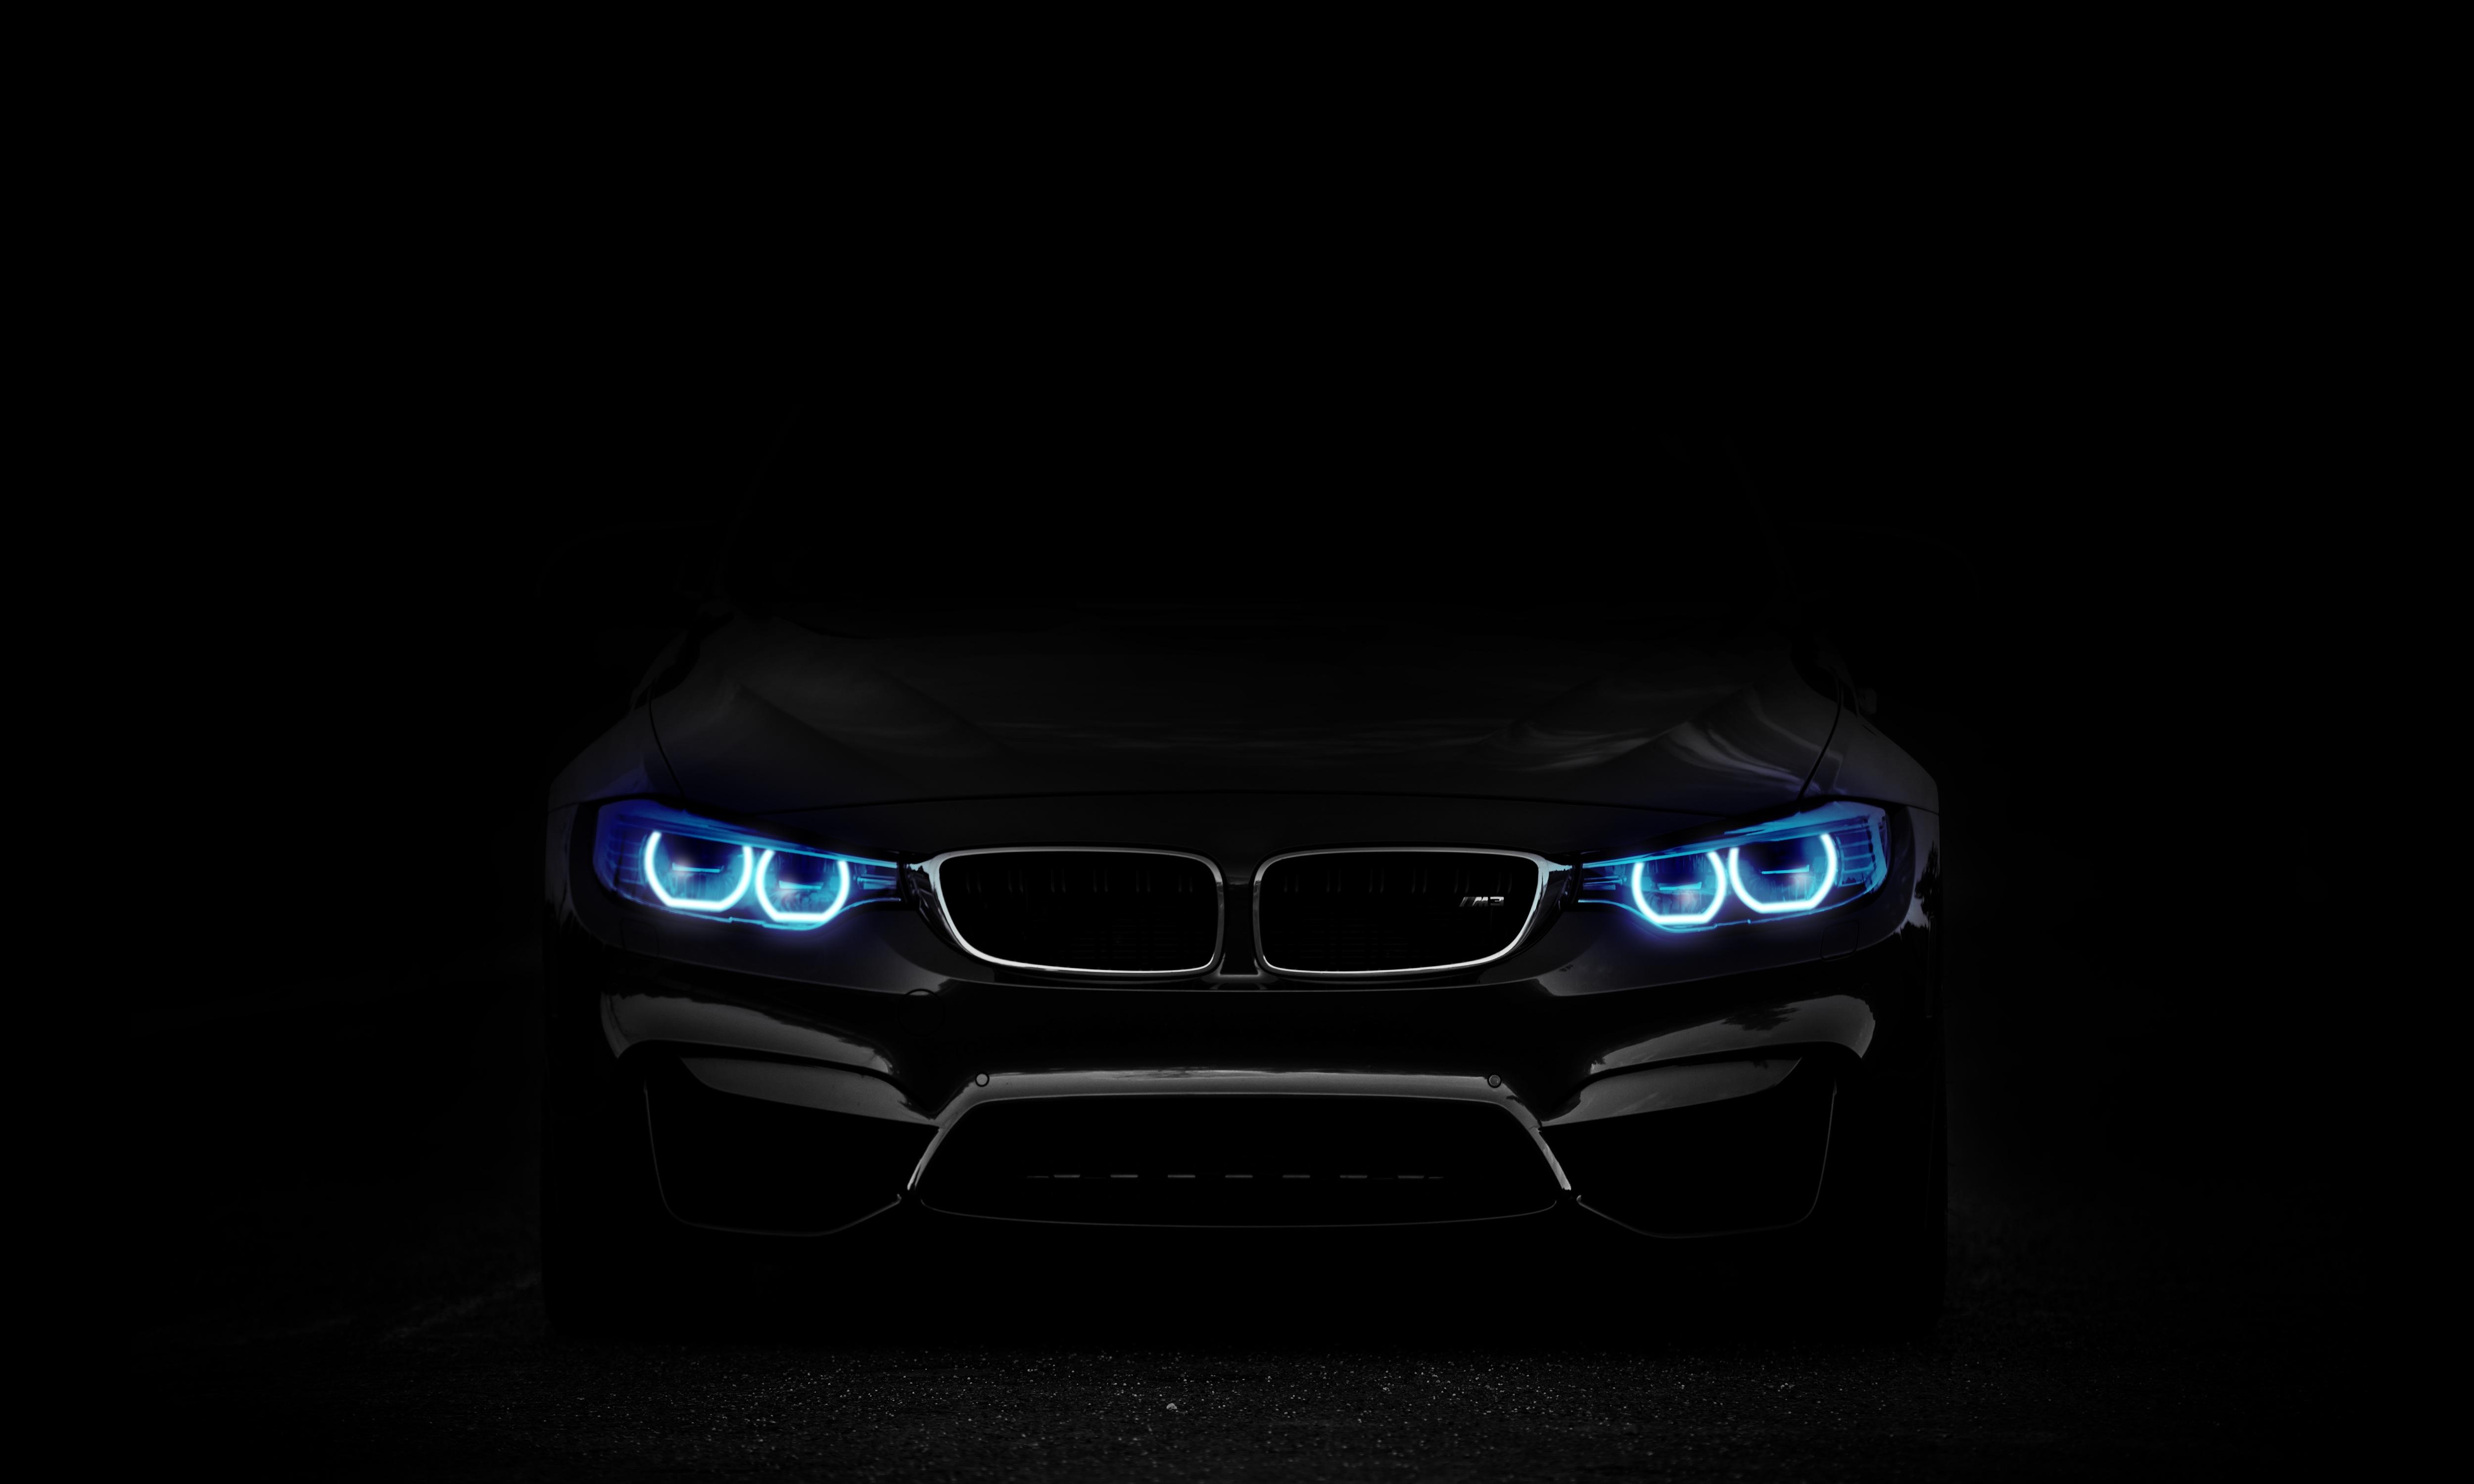 Bmw headlights lights